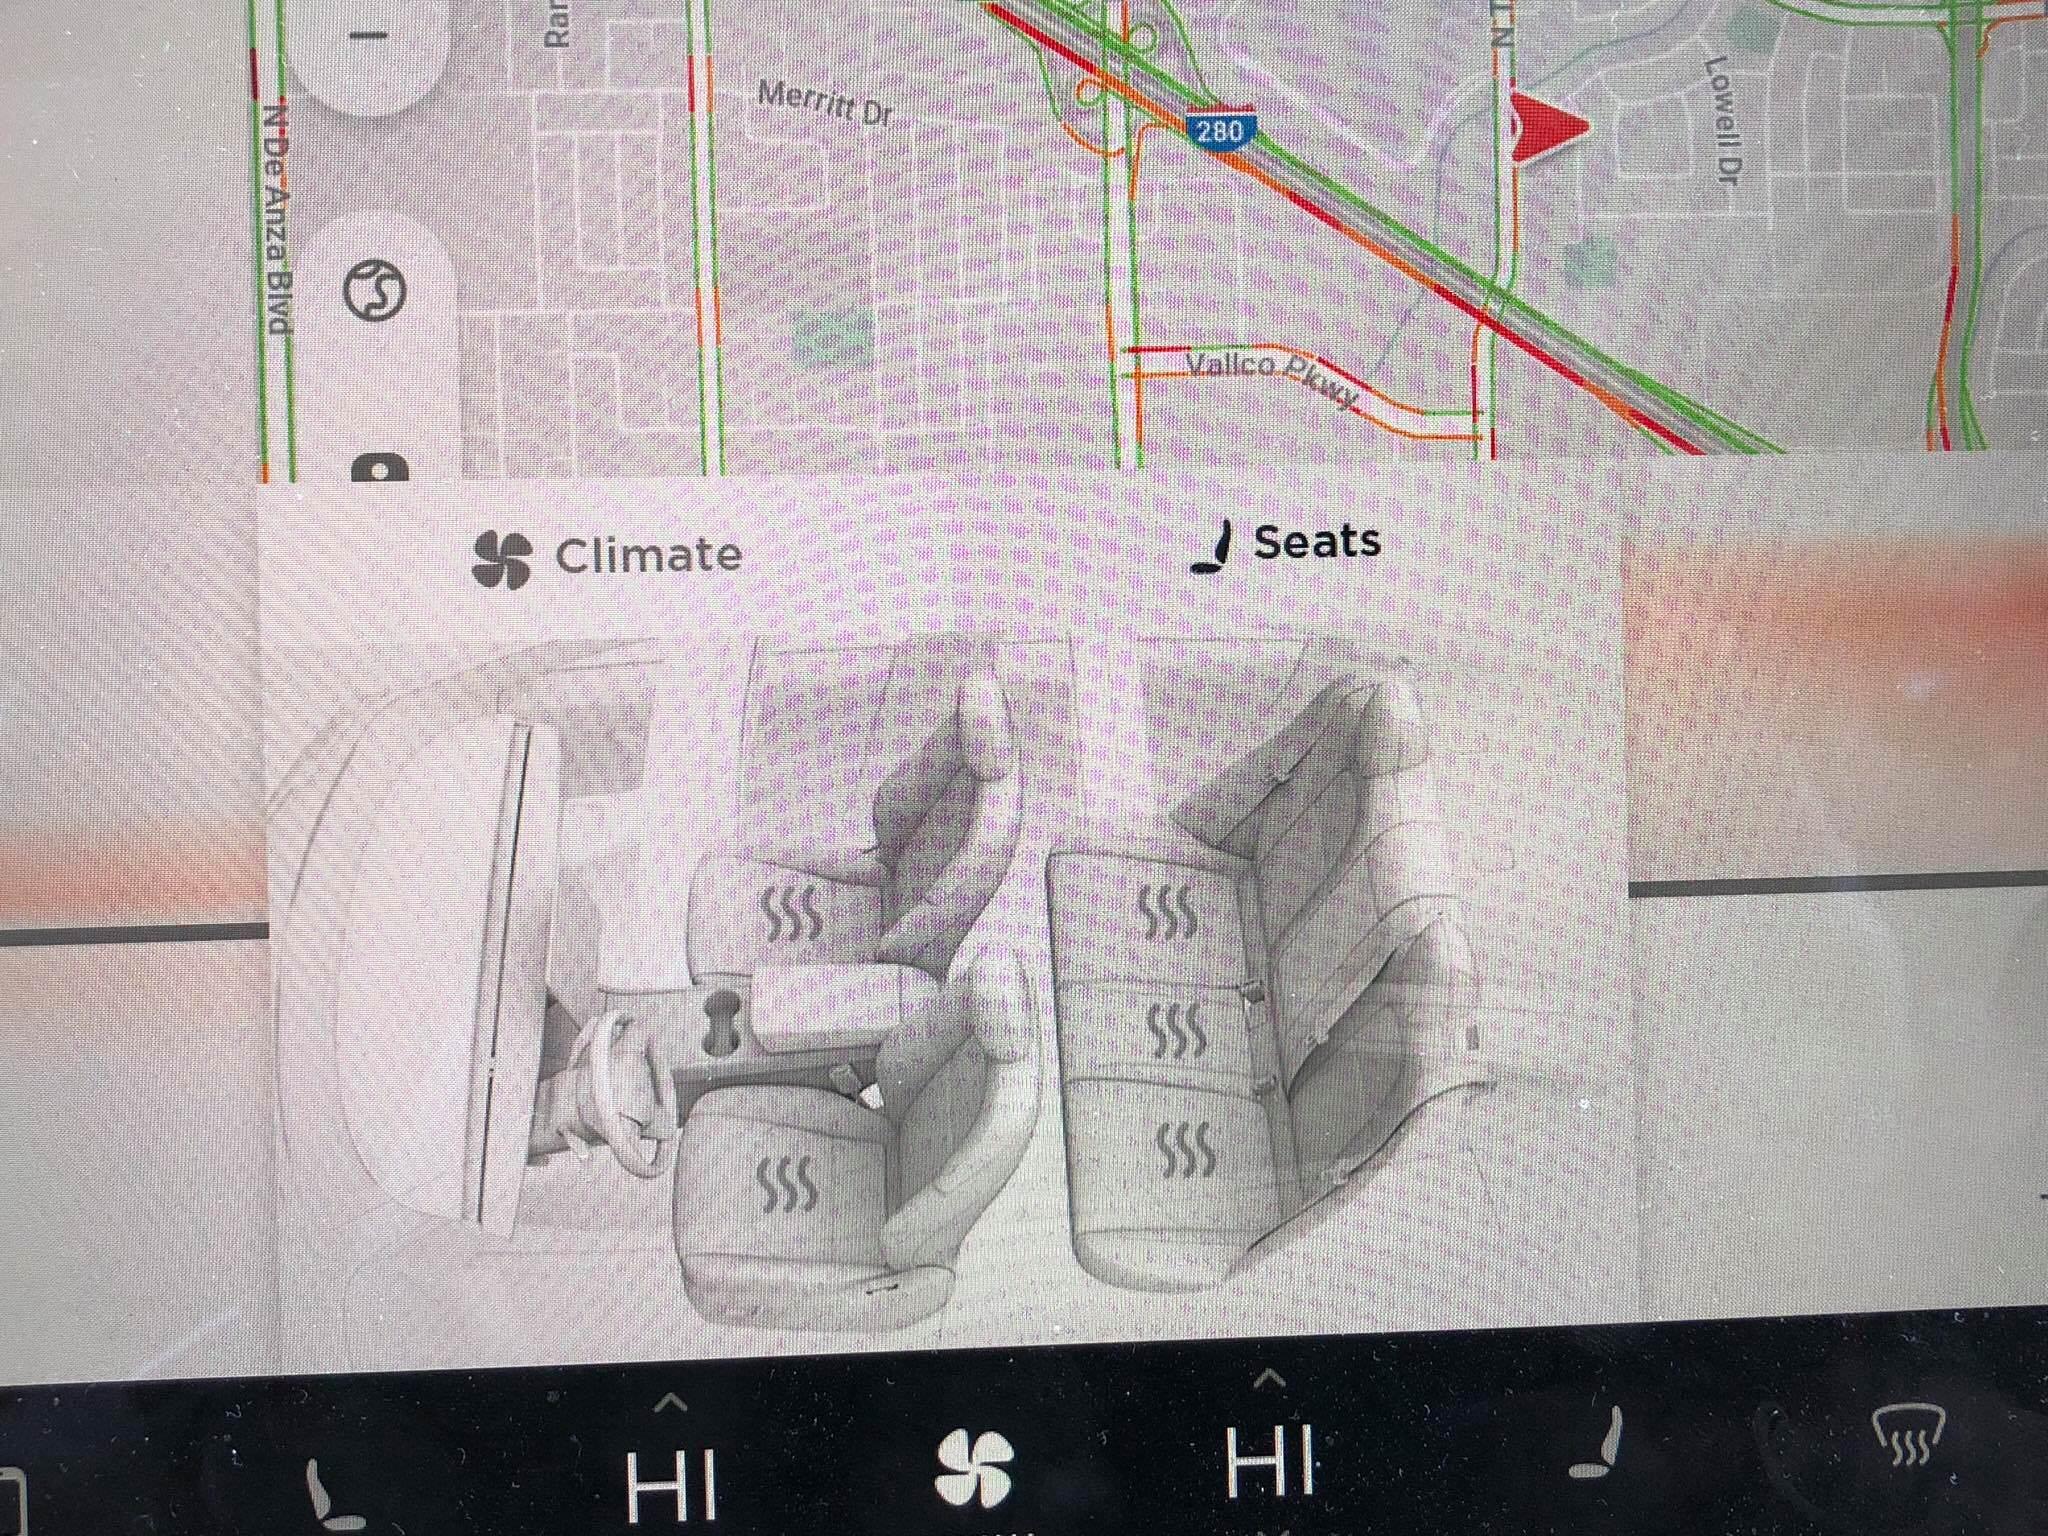 Model 3 update 2018.10.1 heated rear seats (4) [Credit: Raghuram Kamath via helicopterrun/Reddit]